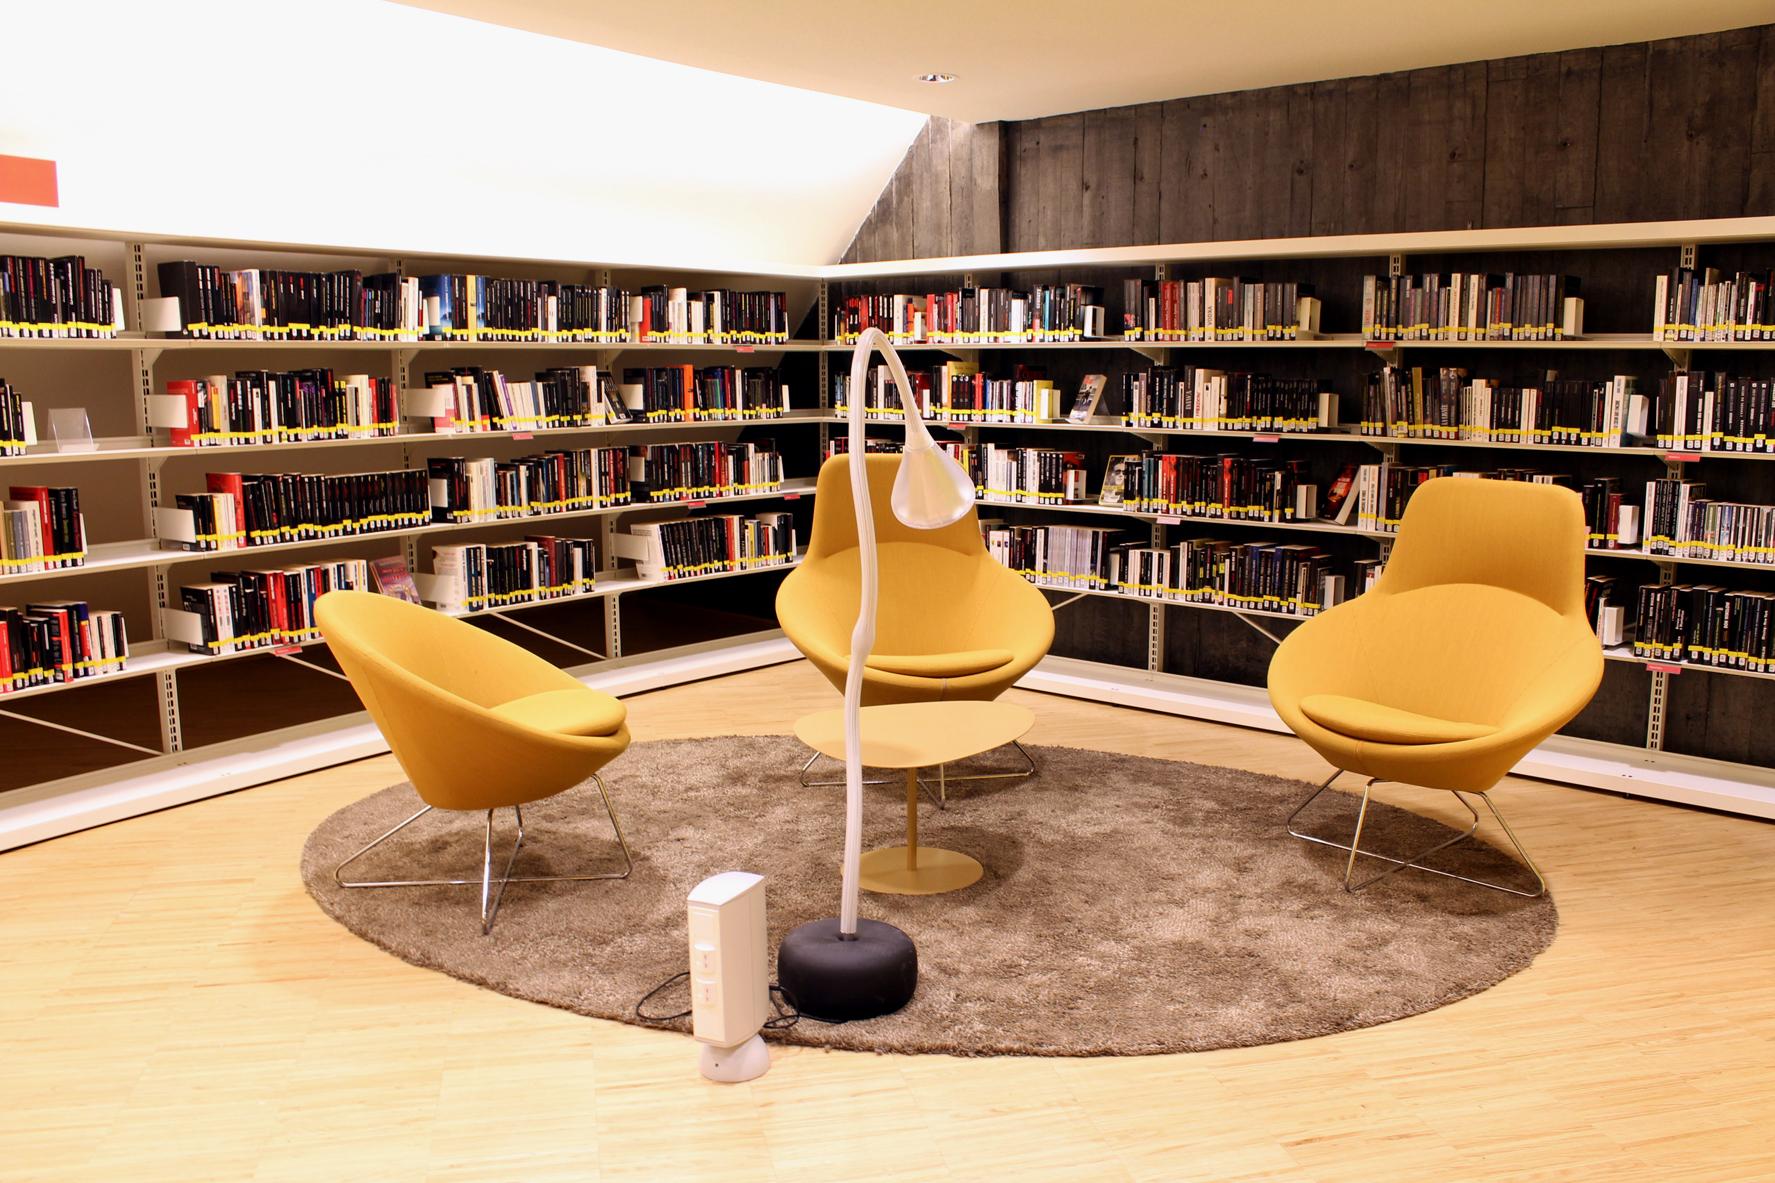 biblioth que municipale du havre wikip dia. Black Bedroom Furniture Sets. Home Design Ideas